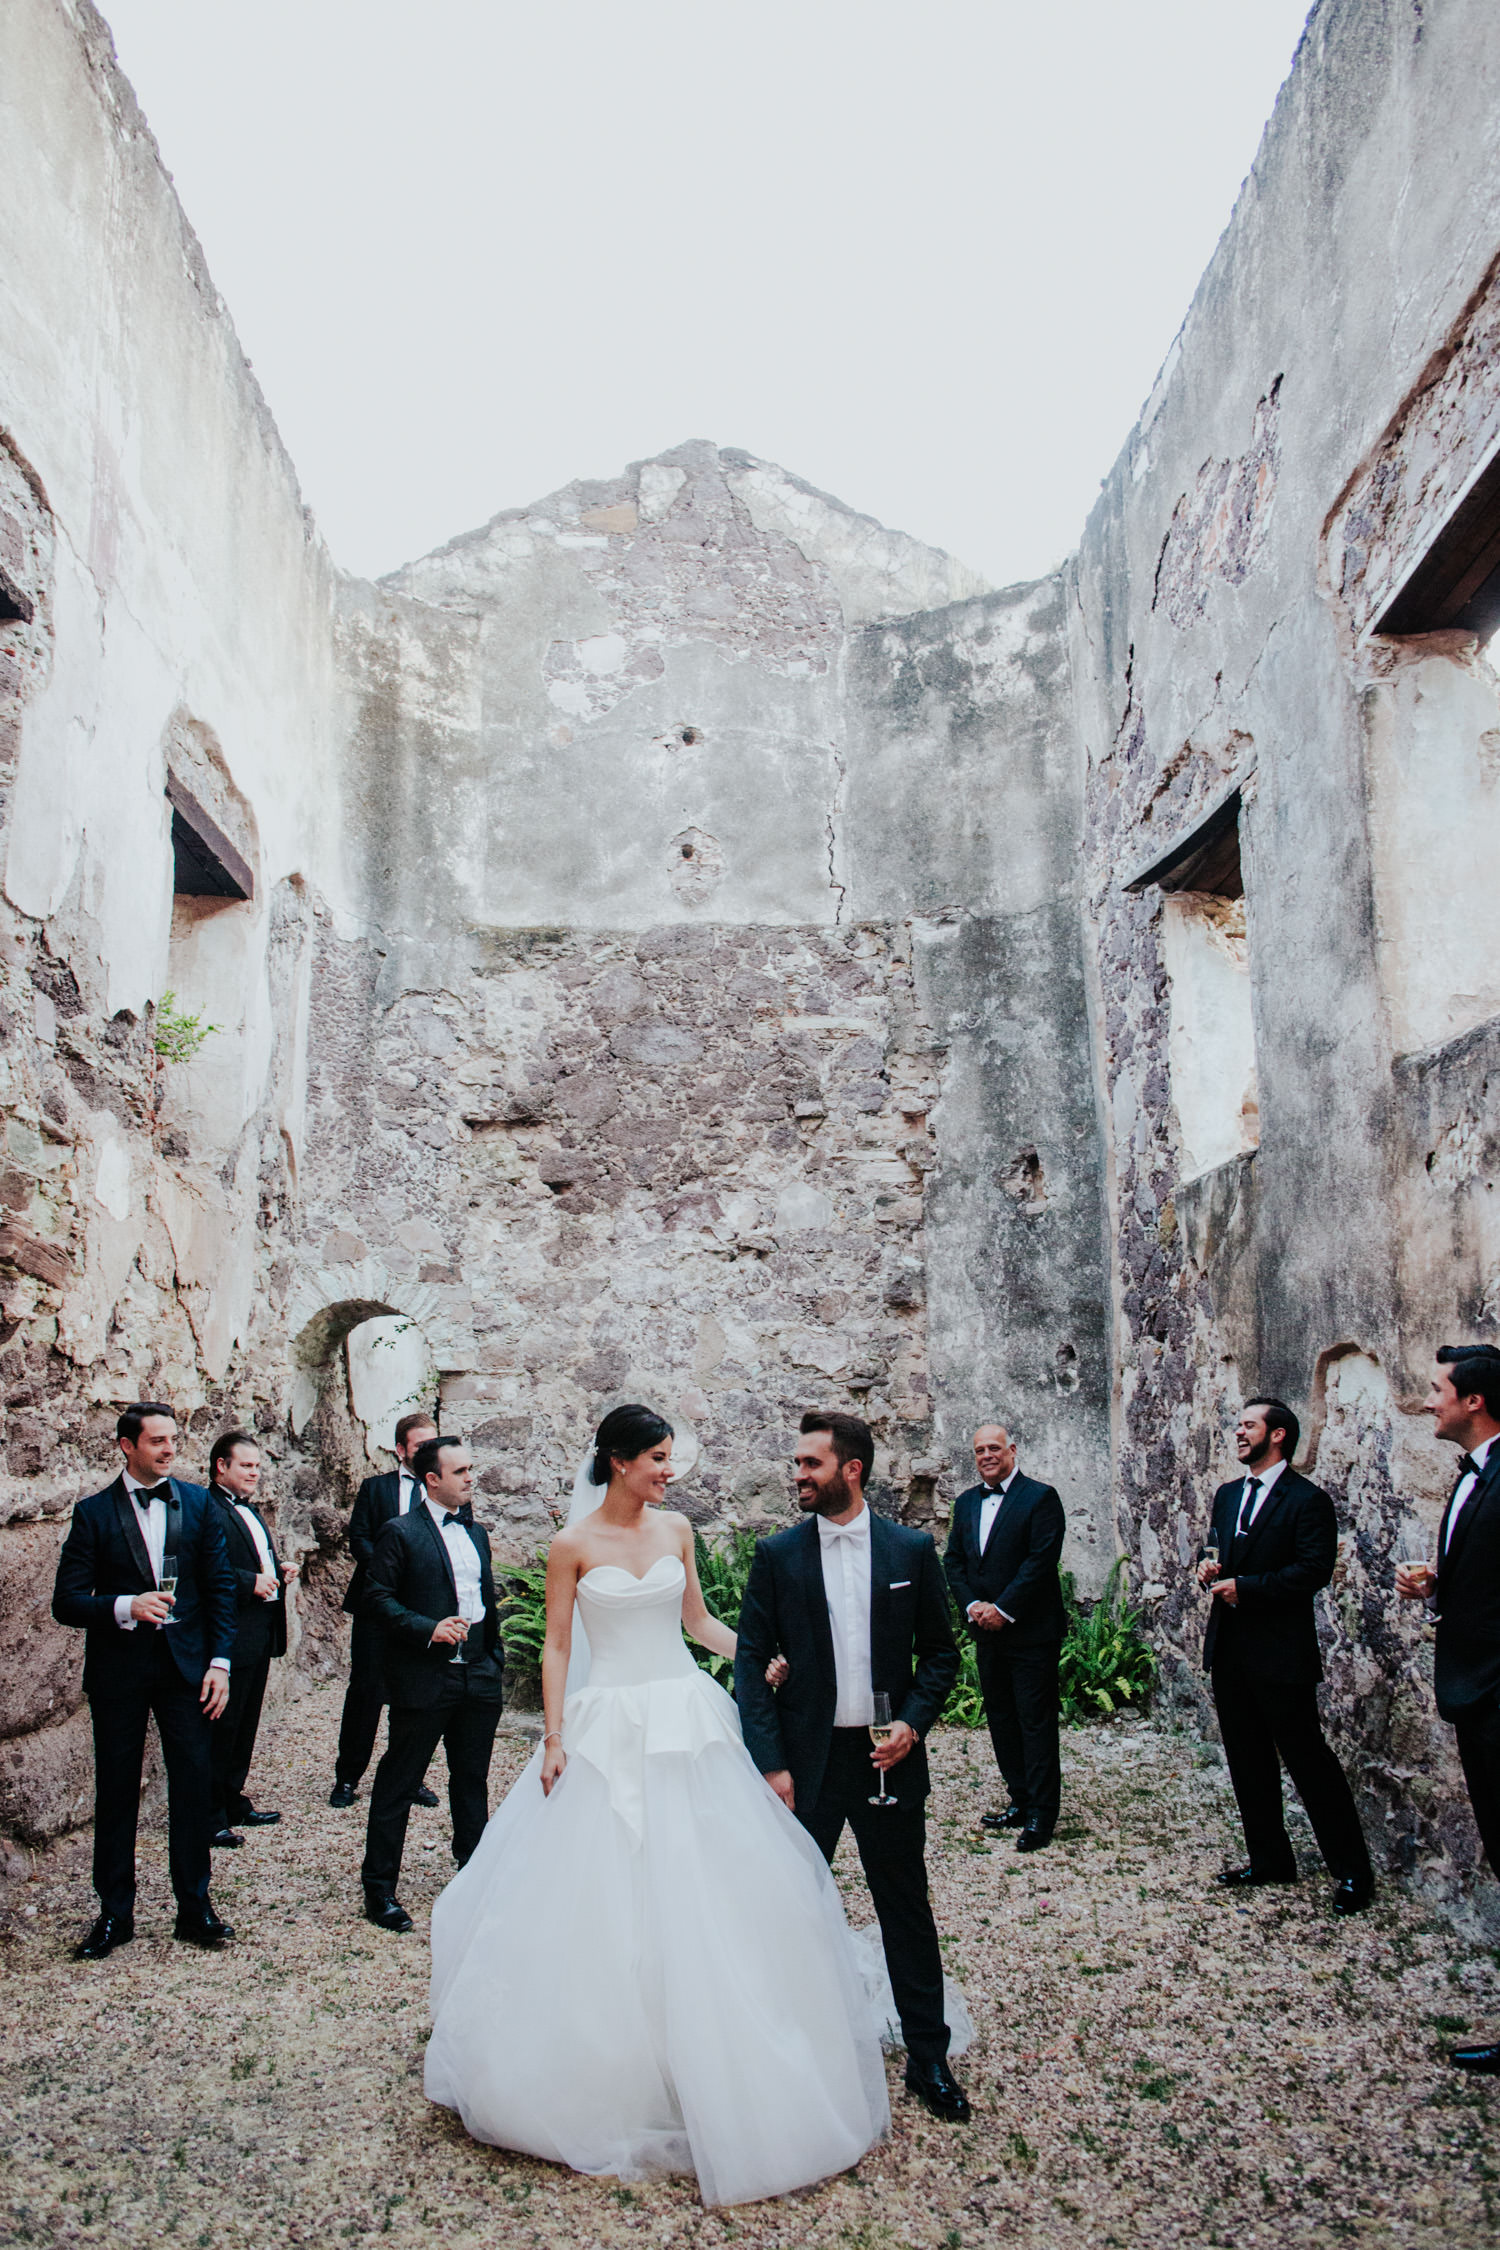 Boda-Guanajuato-Antigua-Hacienda-Dolores-Barrera-Fotografia-Pierce-Photography-Mariana-Jorge--97.jpg